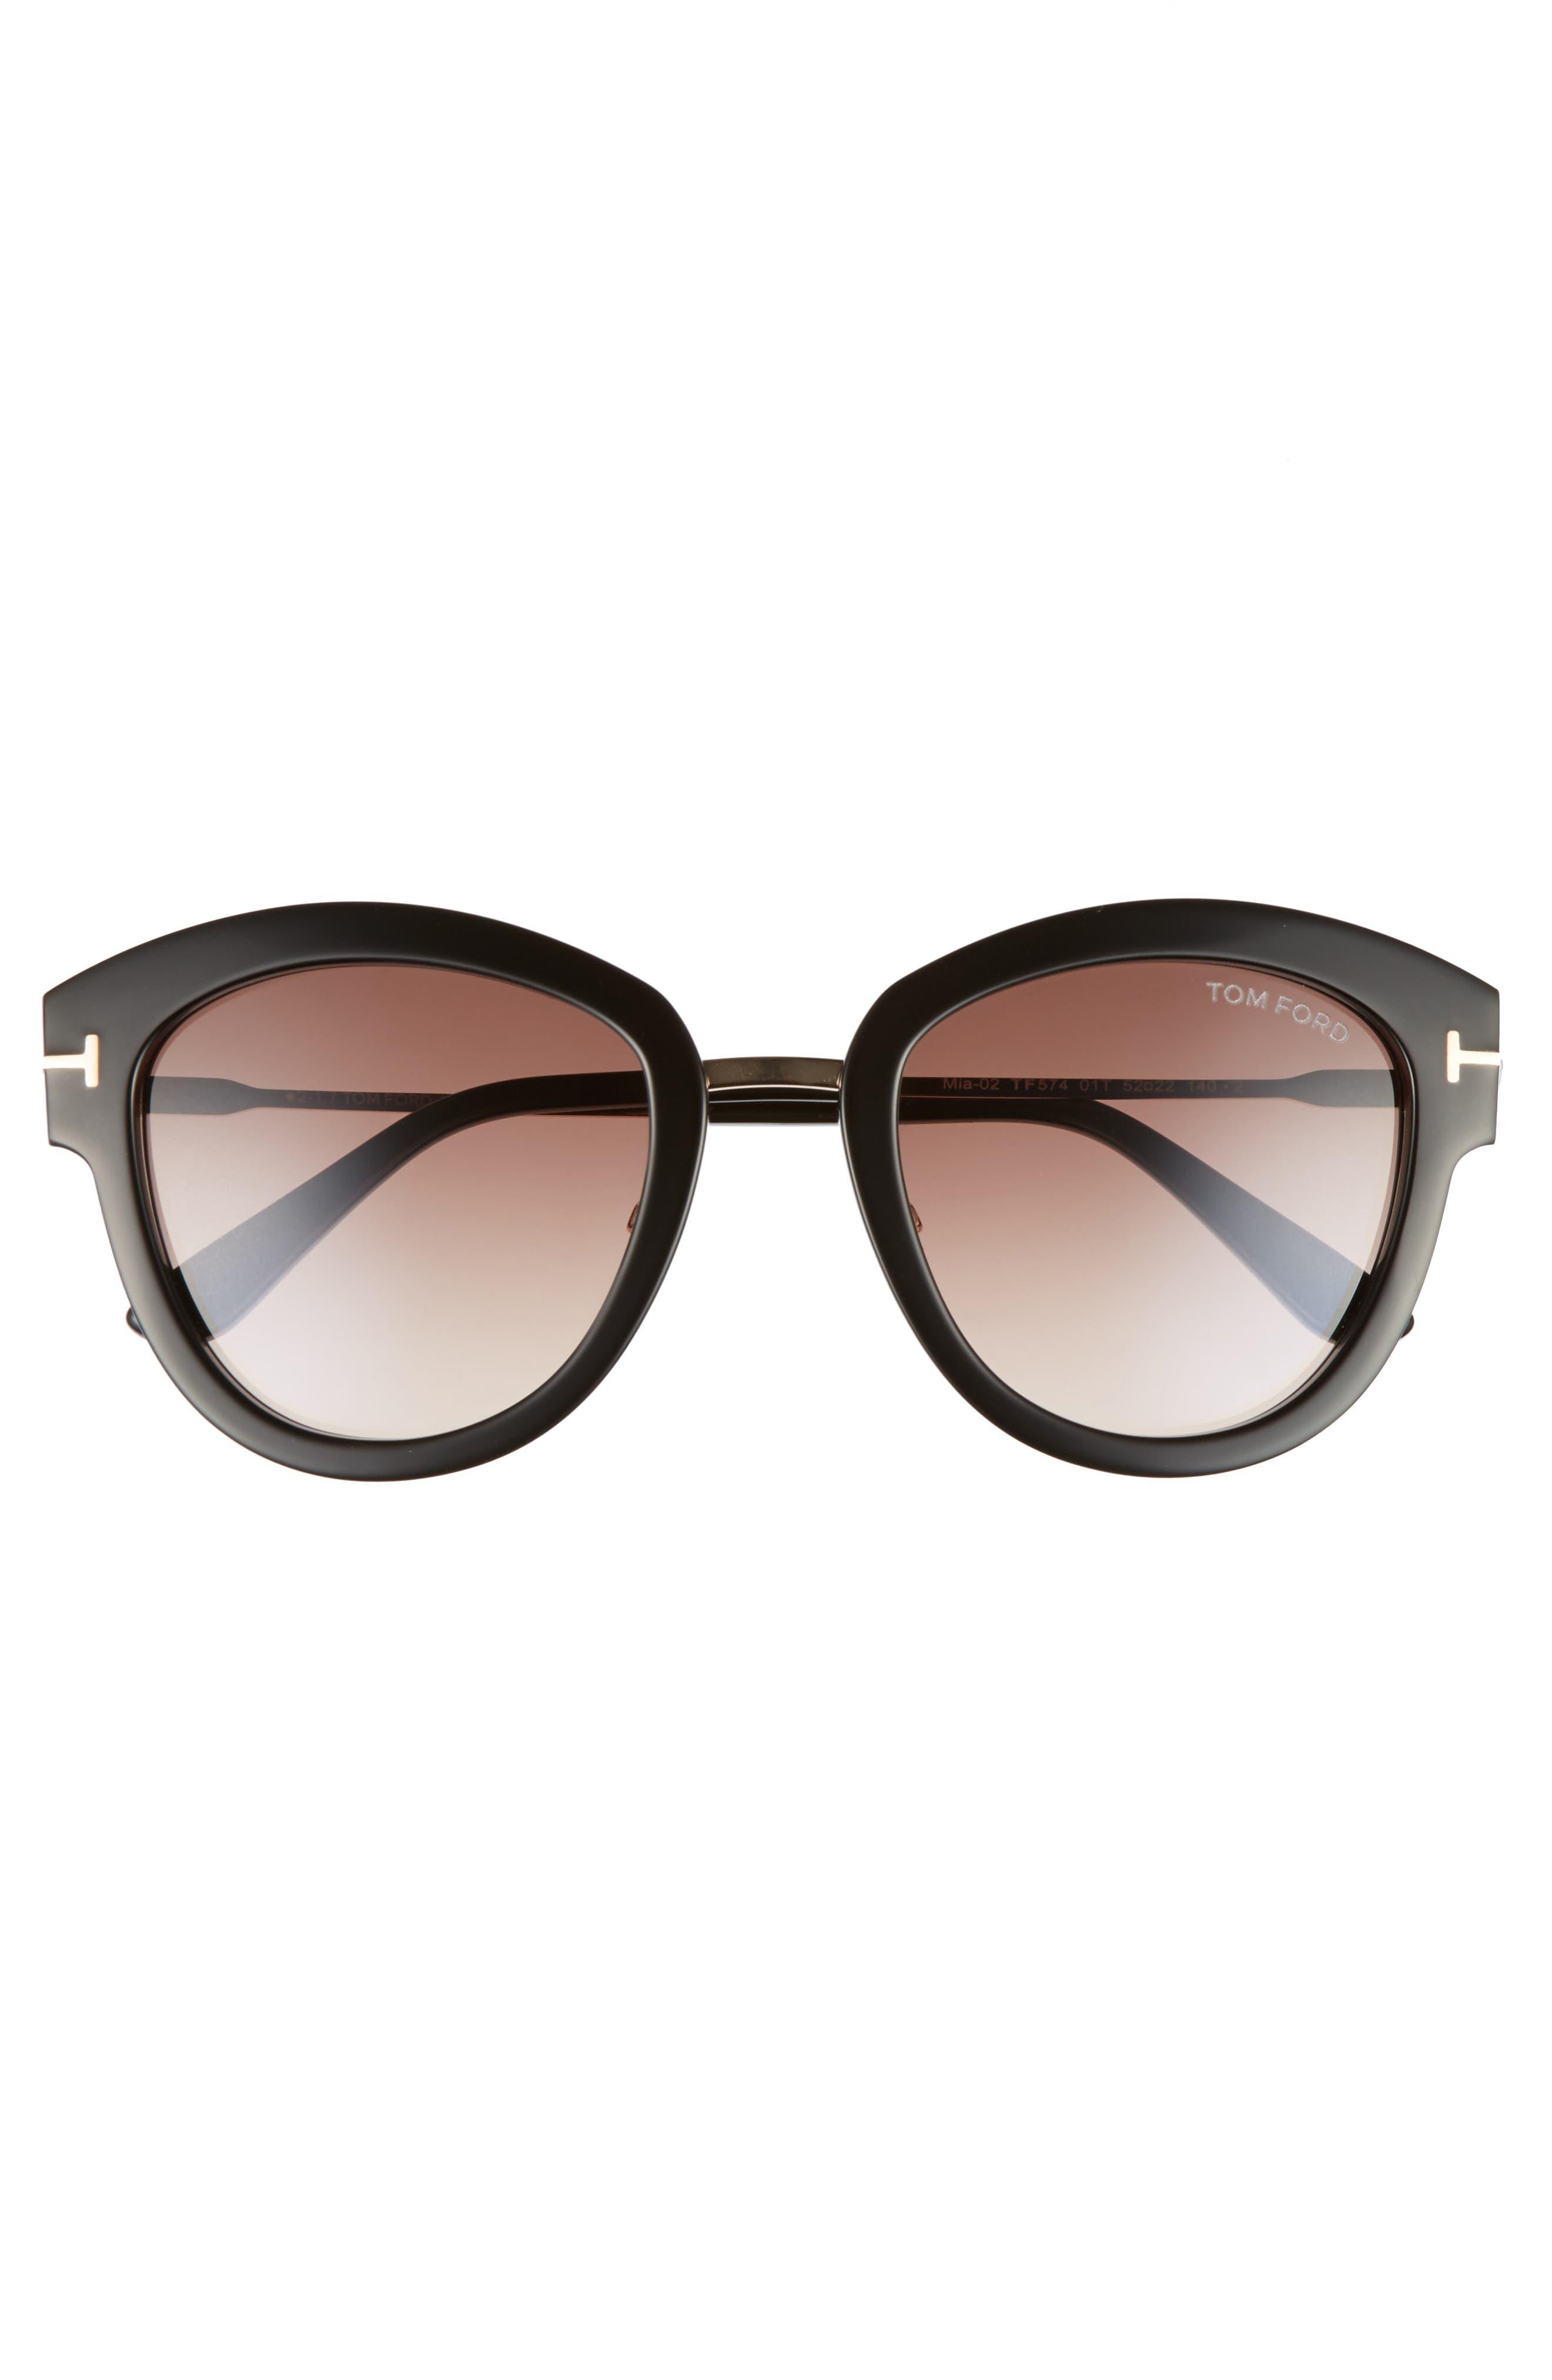 Mia 55mm Cat Eye Sunglasses,                             Alternate thumbnail 3, color,                             BLACK ACETATE/ ROSE GOLD